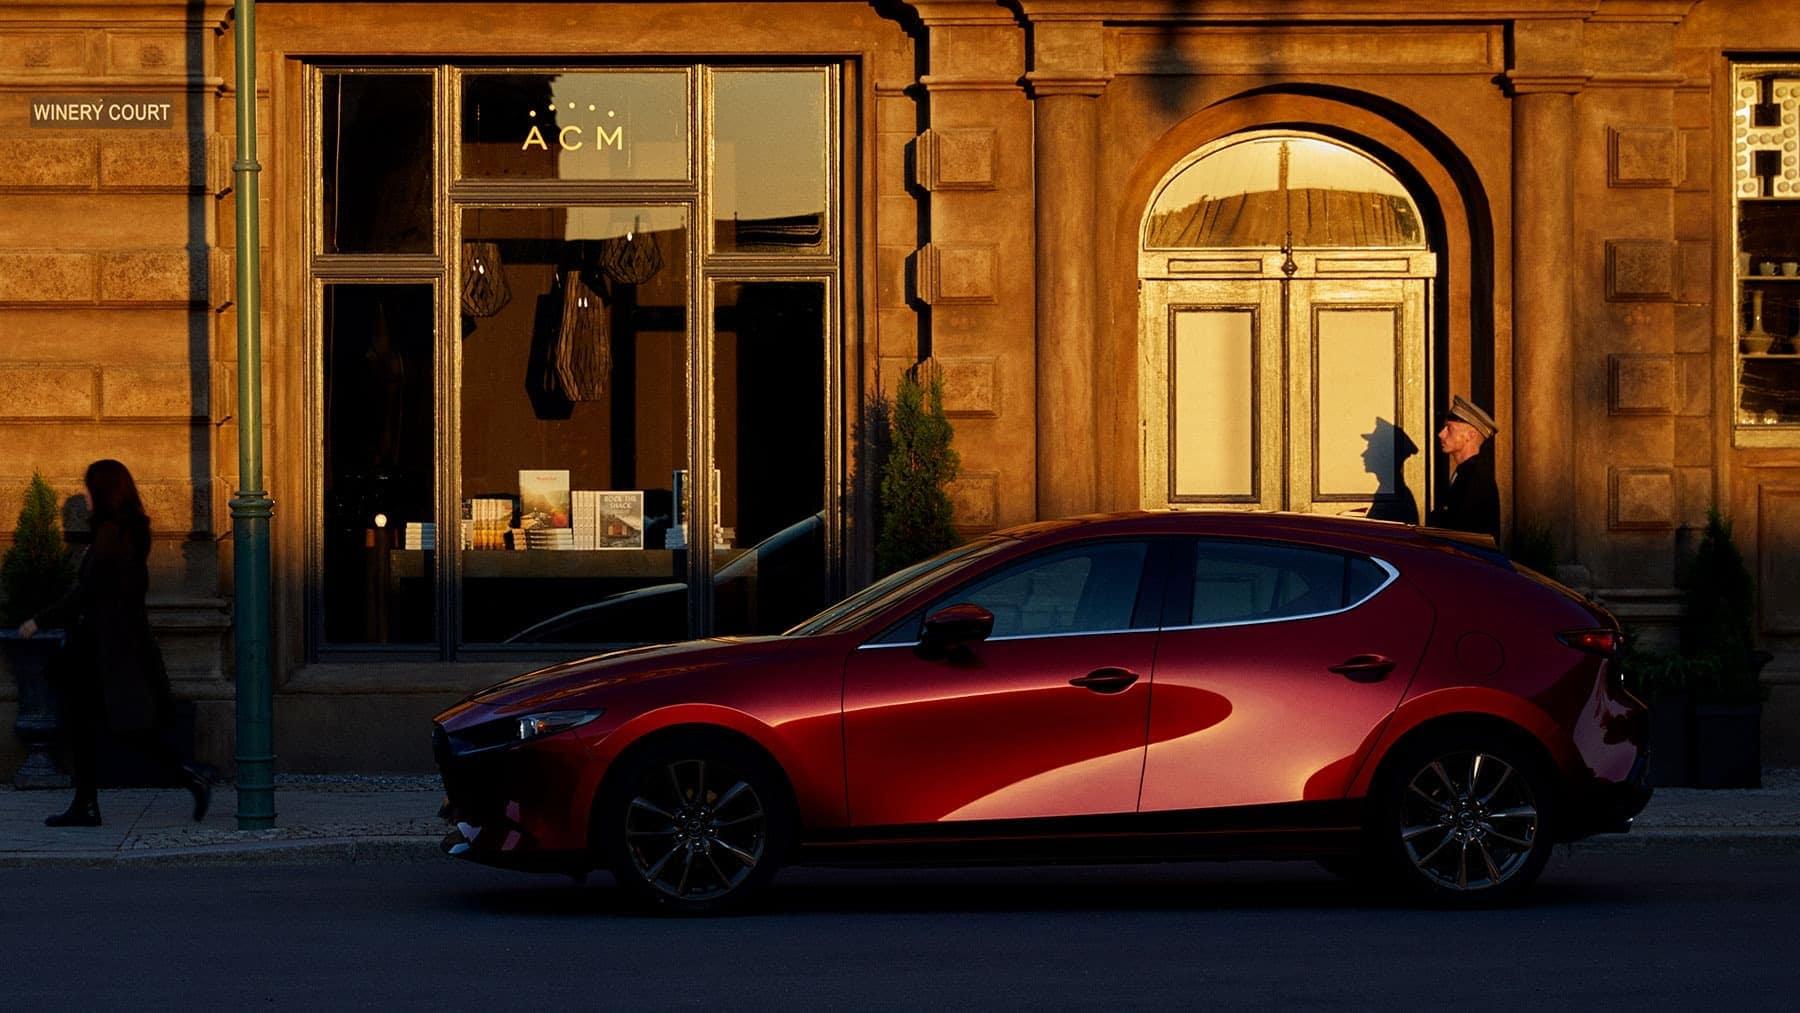 2020 Mazda Mazda3 Hatchback parked